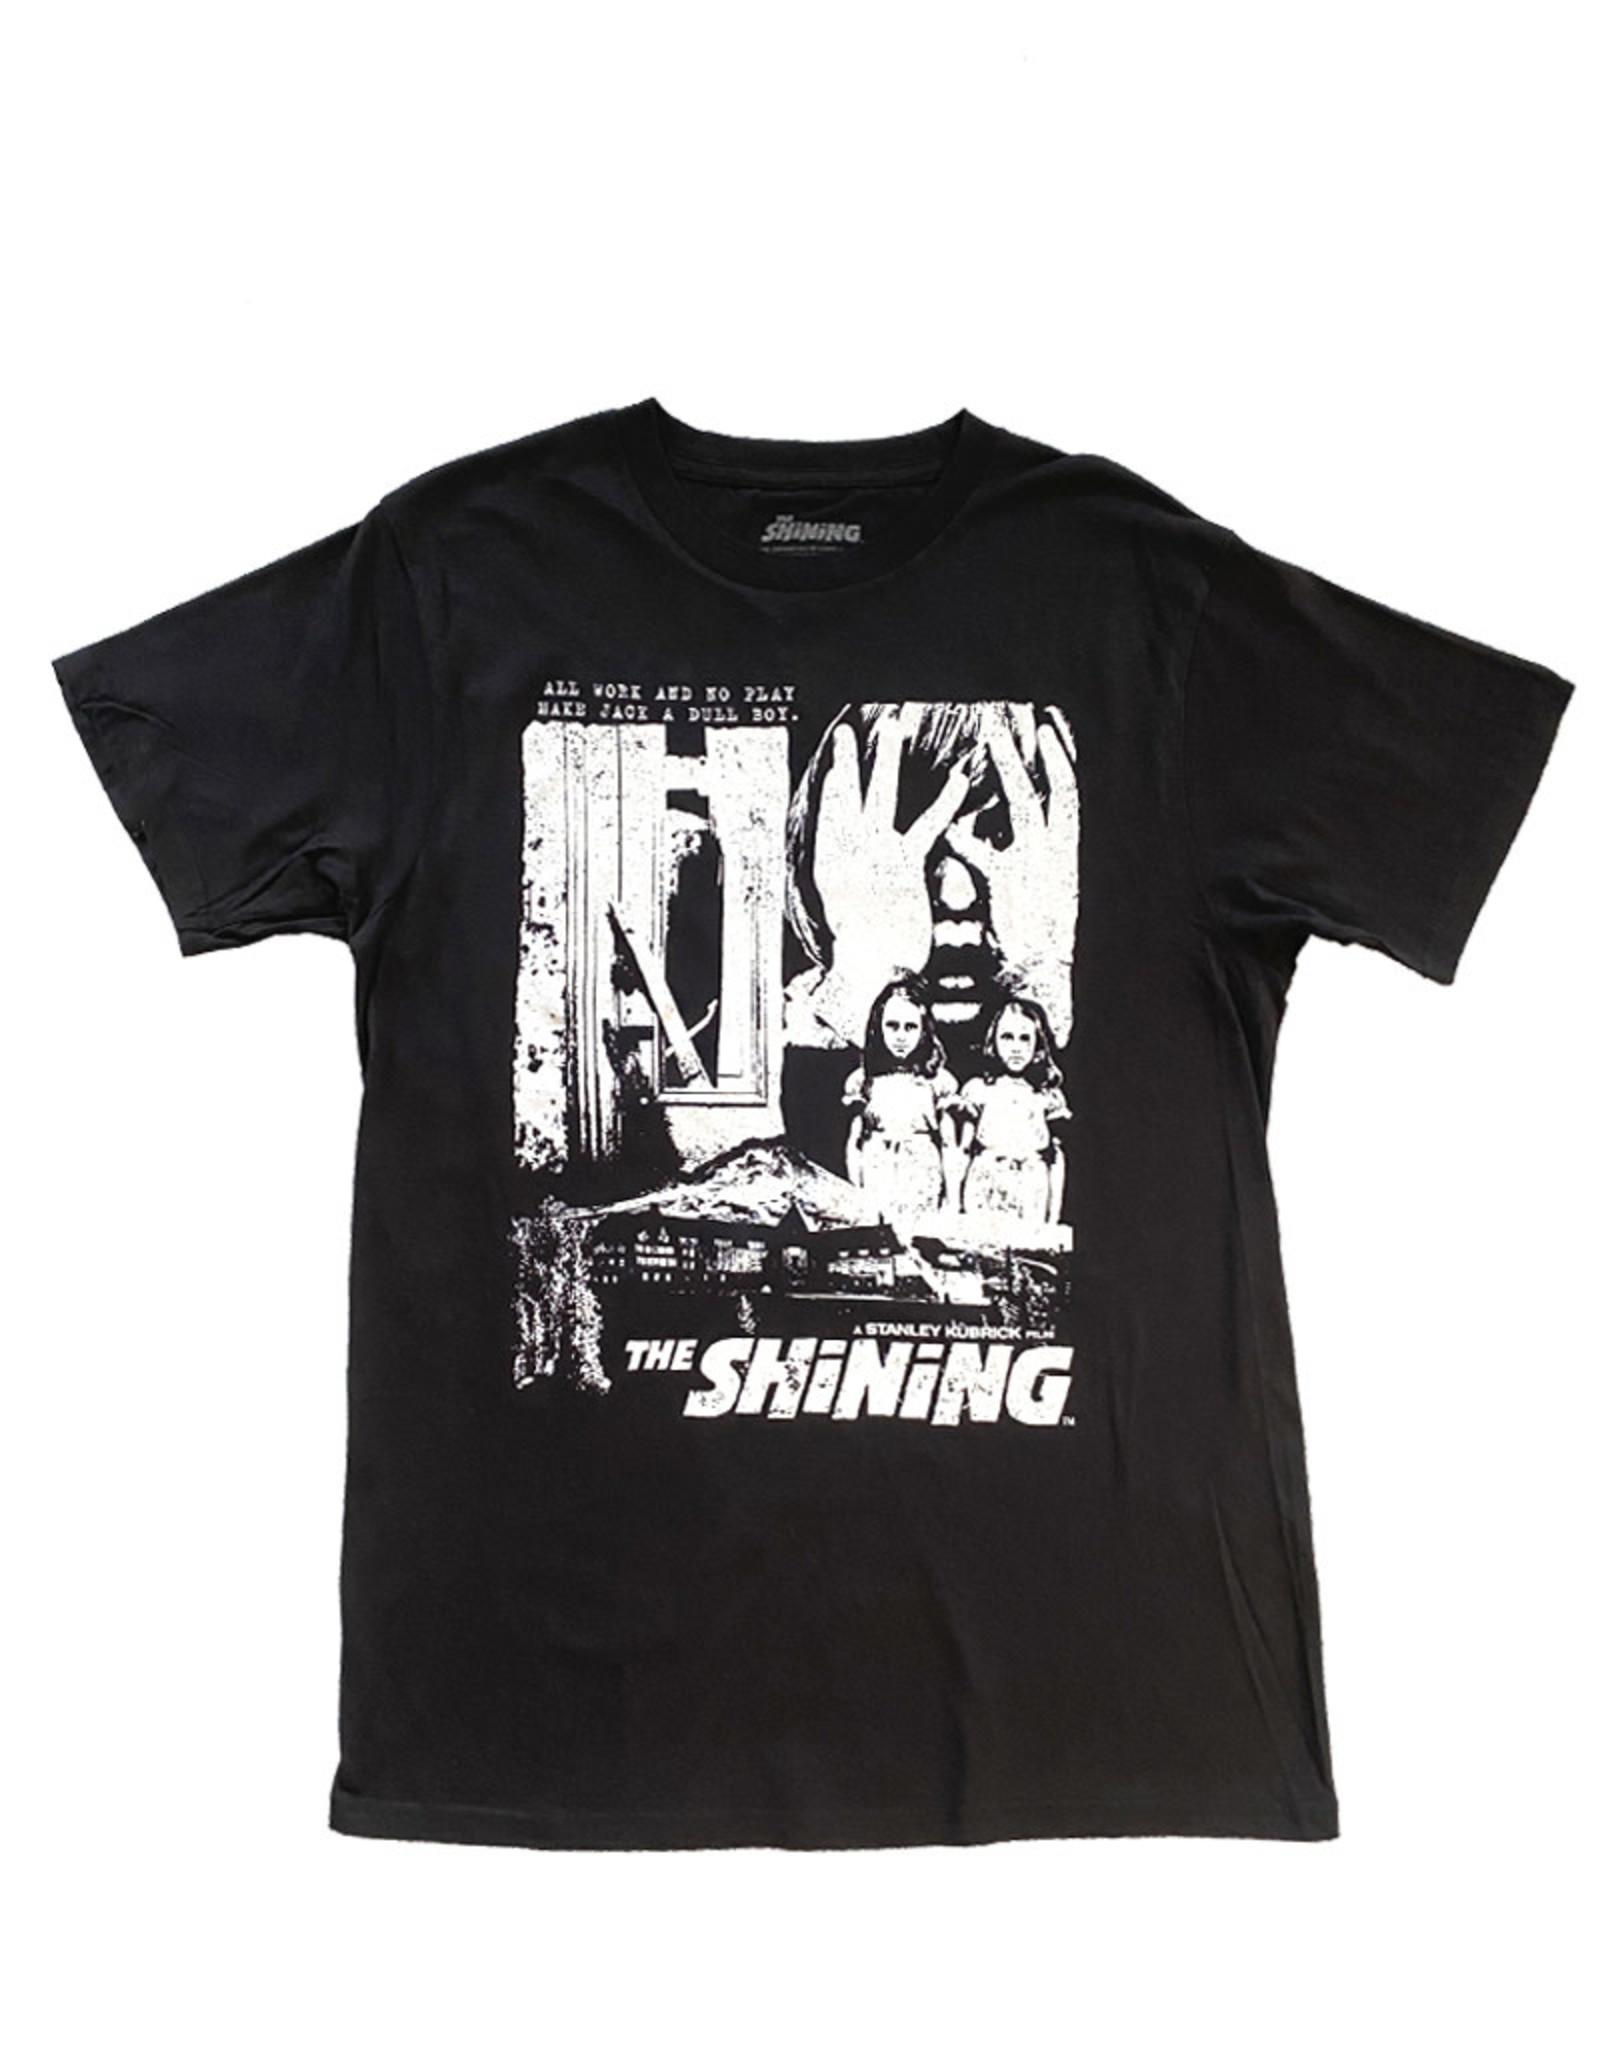 The Shinning ( T-Shirt )